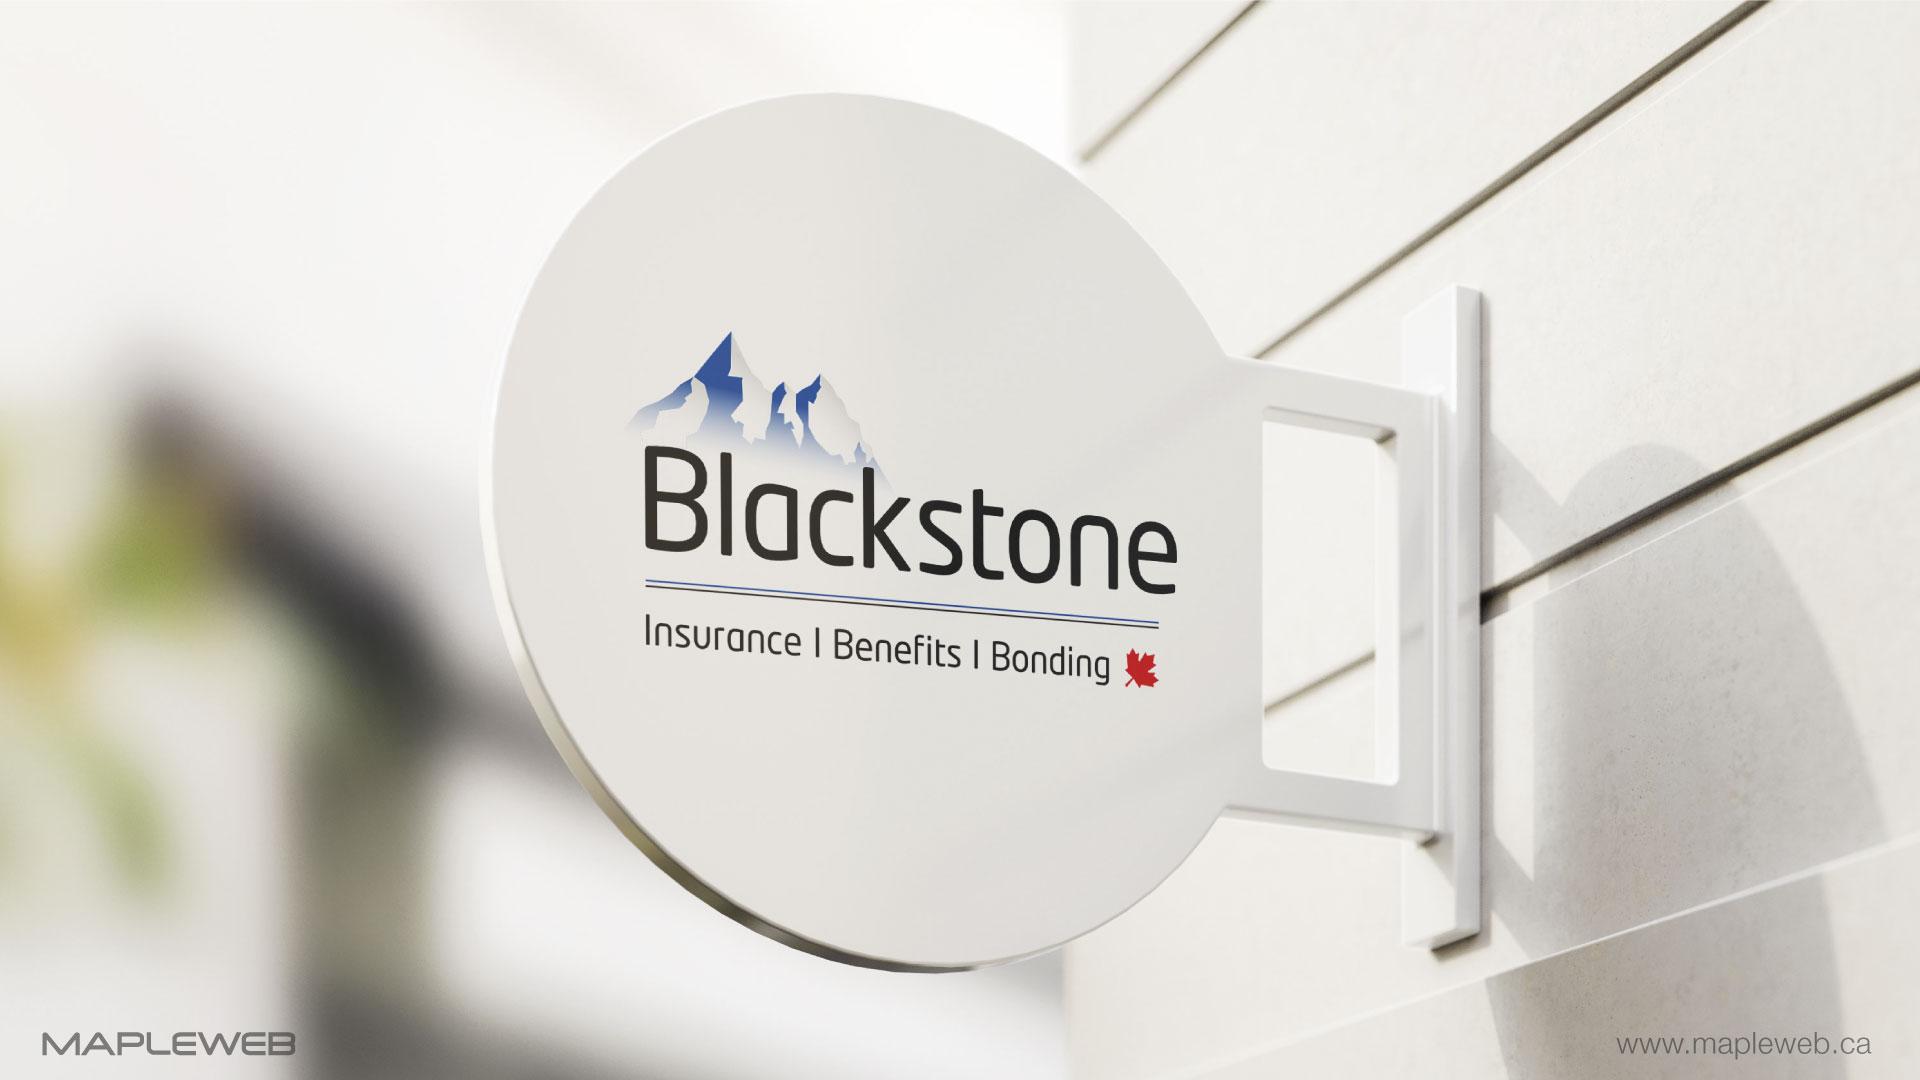 blackstone-brand-logo-design-by-mapleweb-vancouver-canada-outside-signage-mock